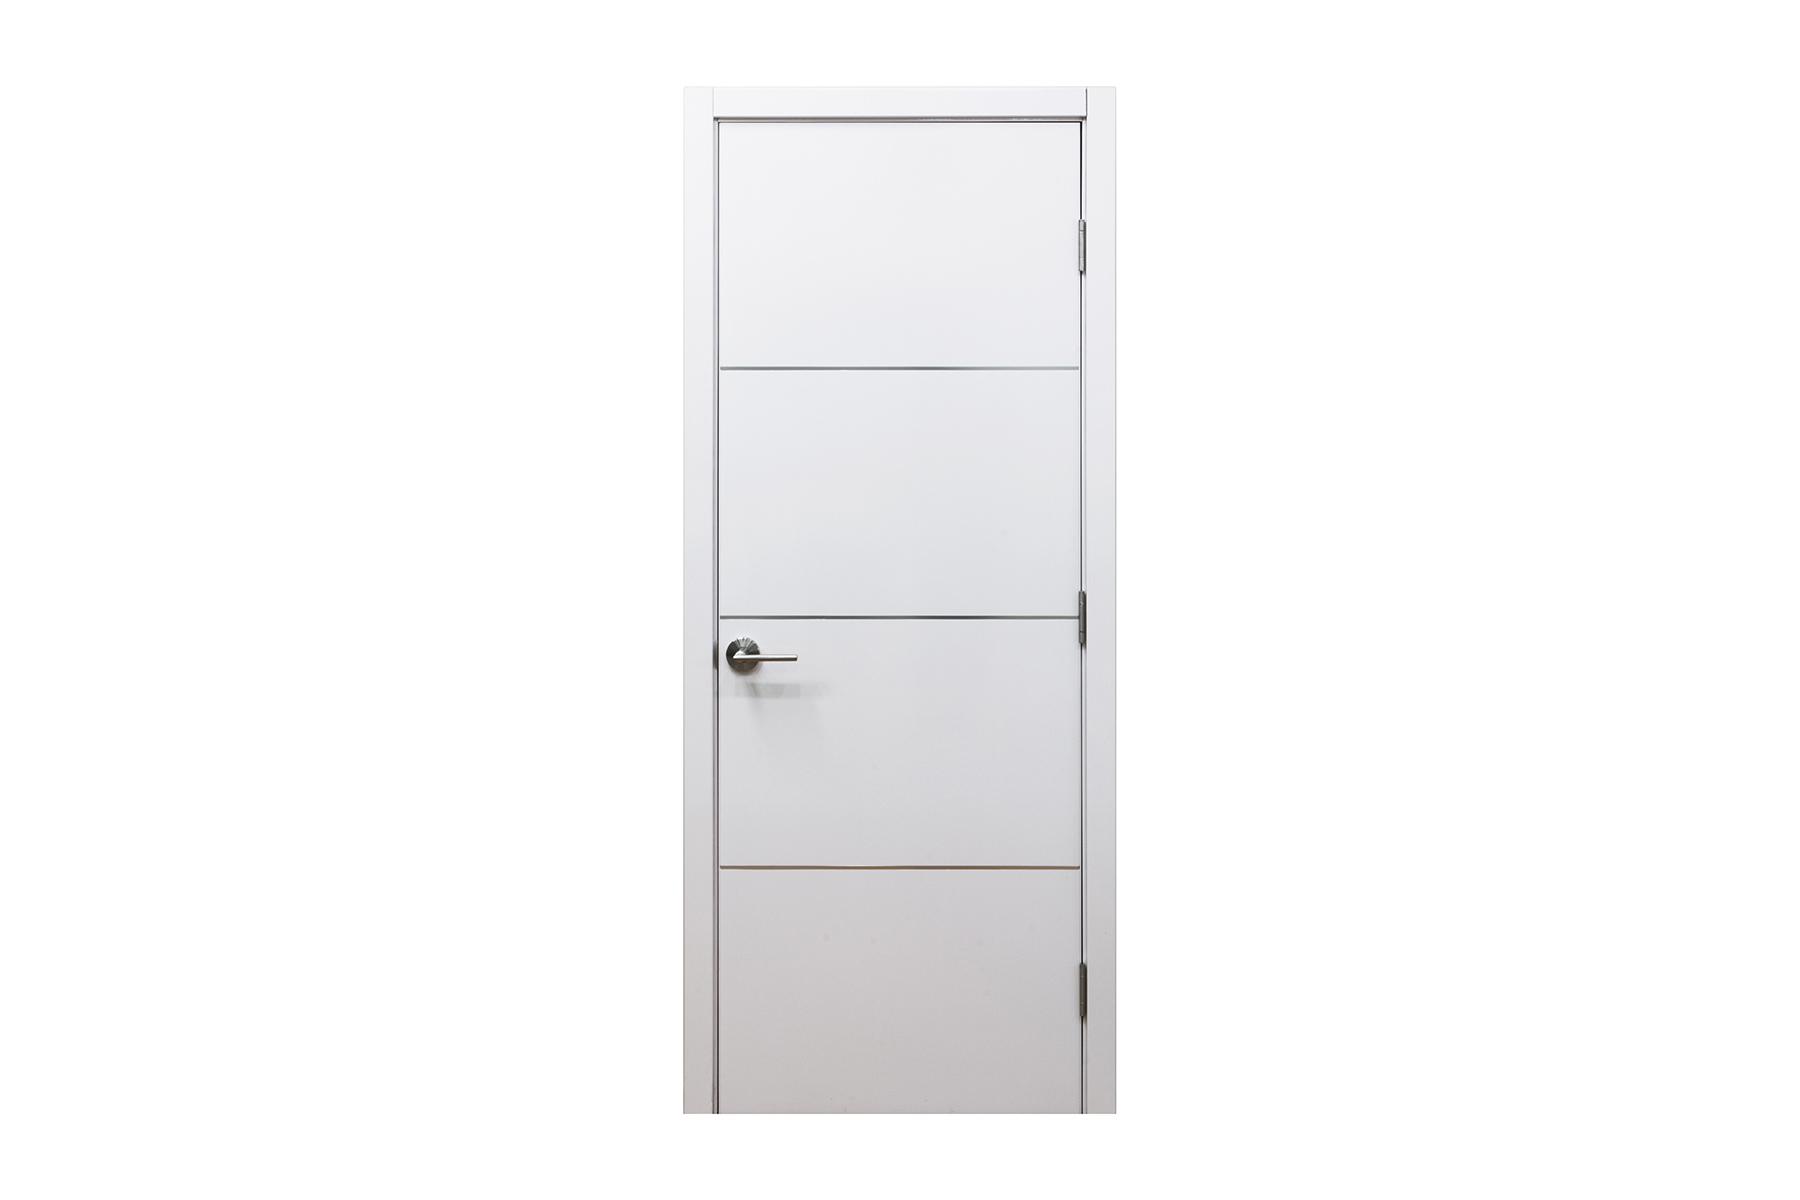 Hg008 interior door white gloss nova interior doors hg008 interior door white gloss planetlyrics Image collections